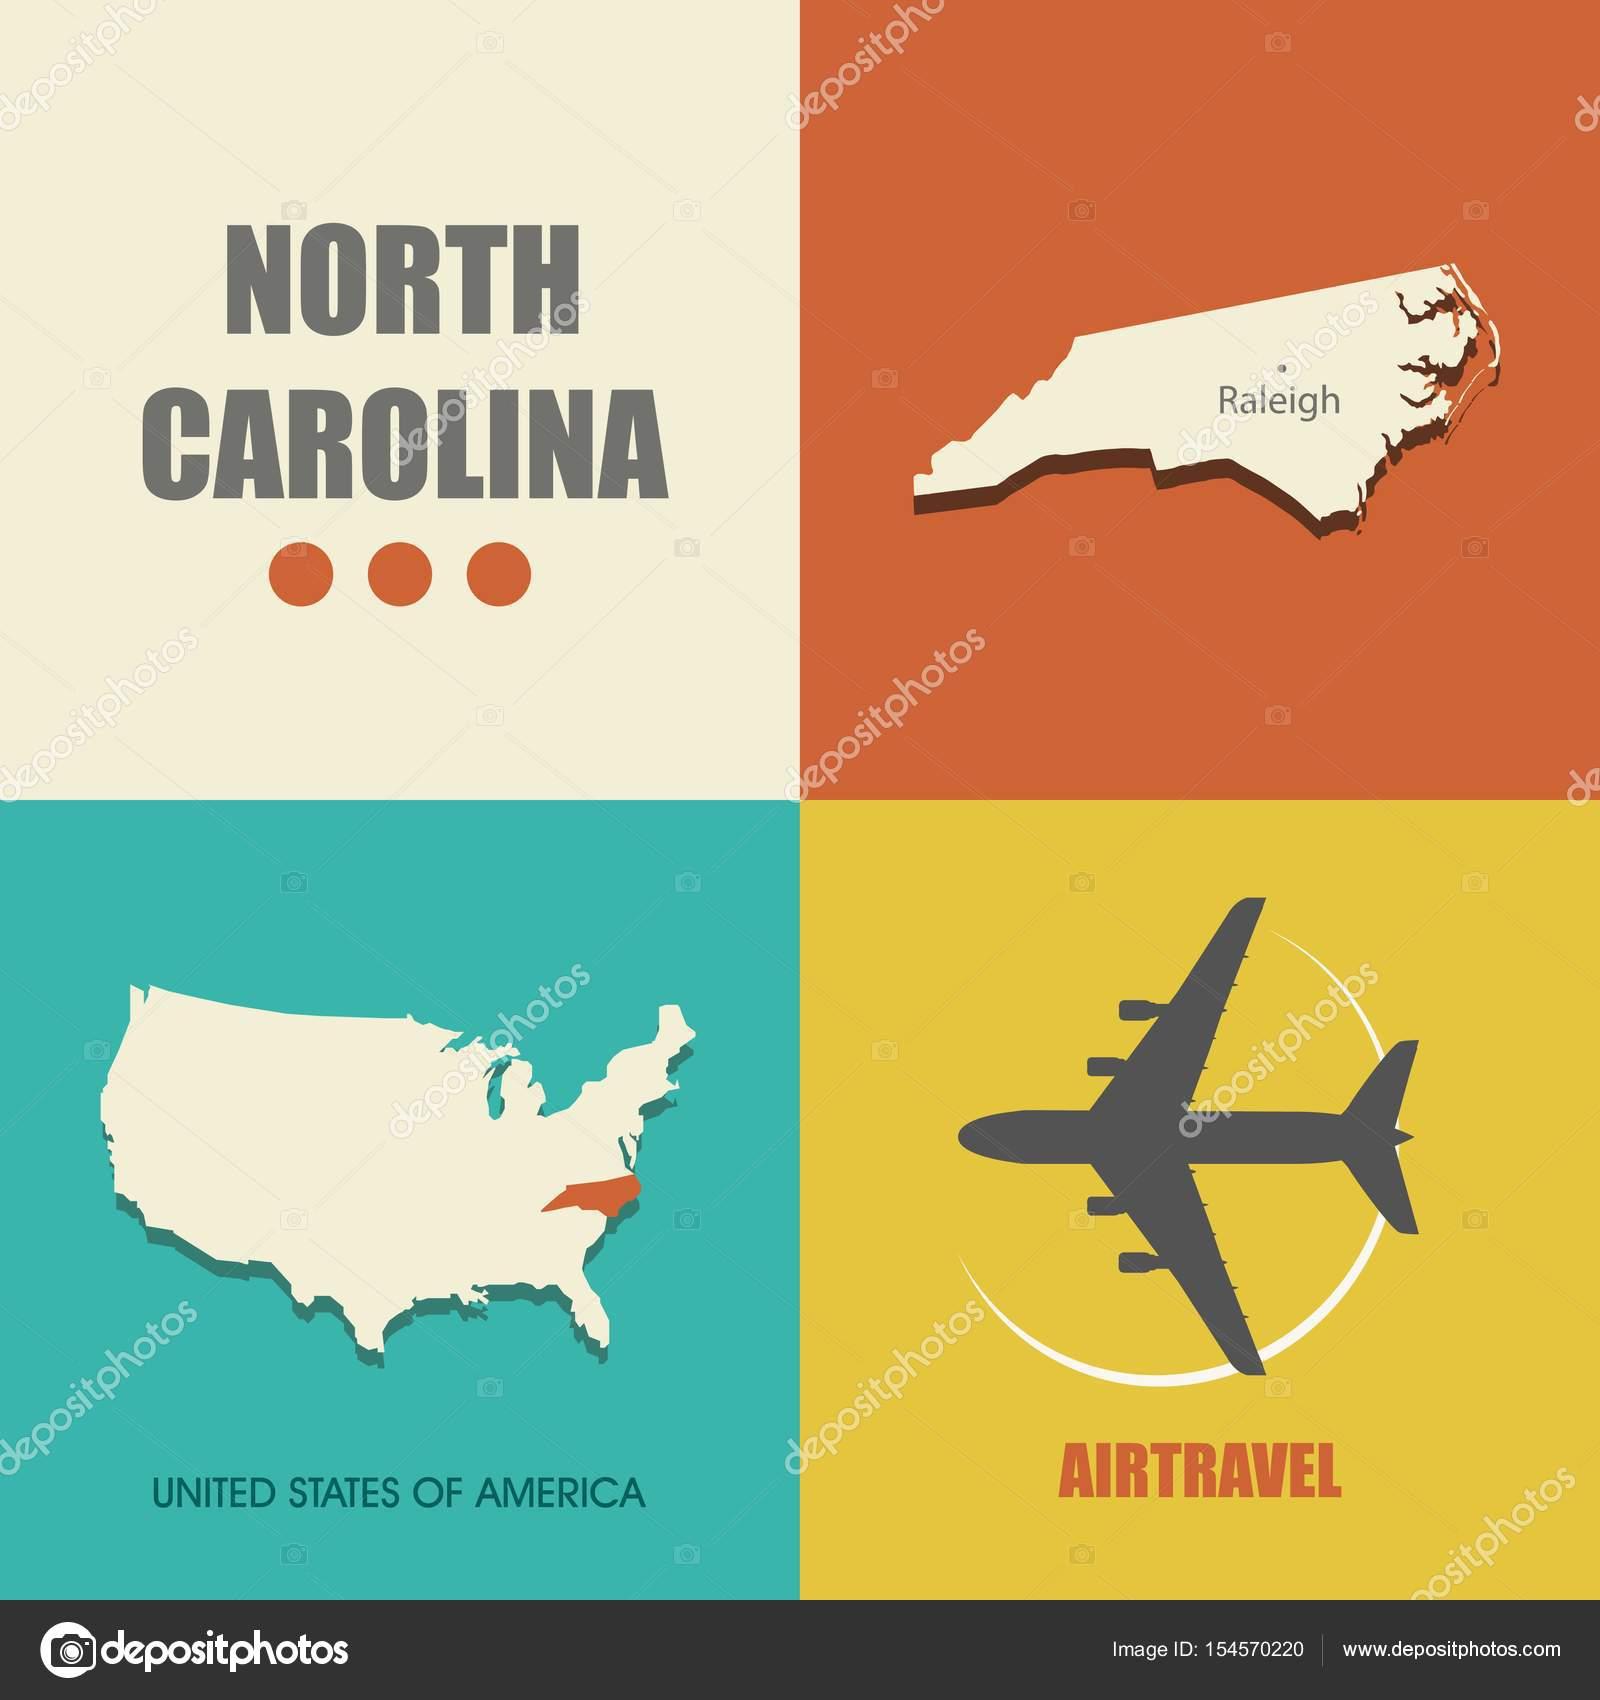 North Carolina map flat